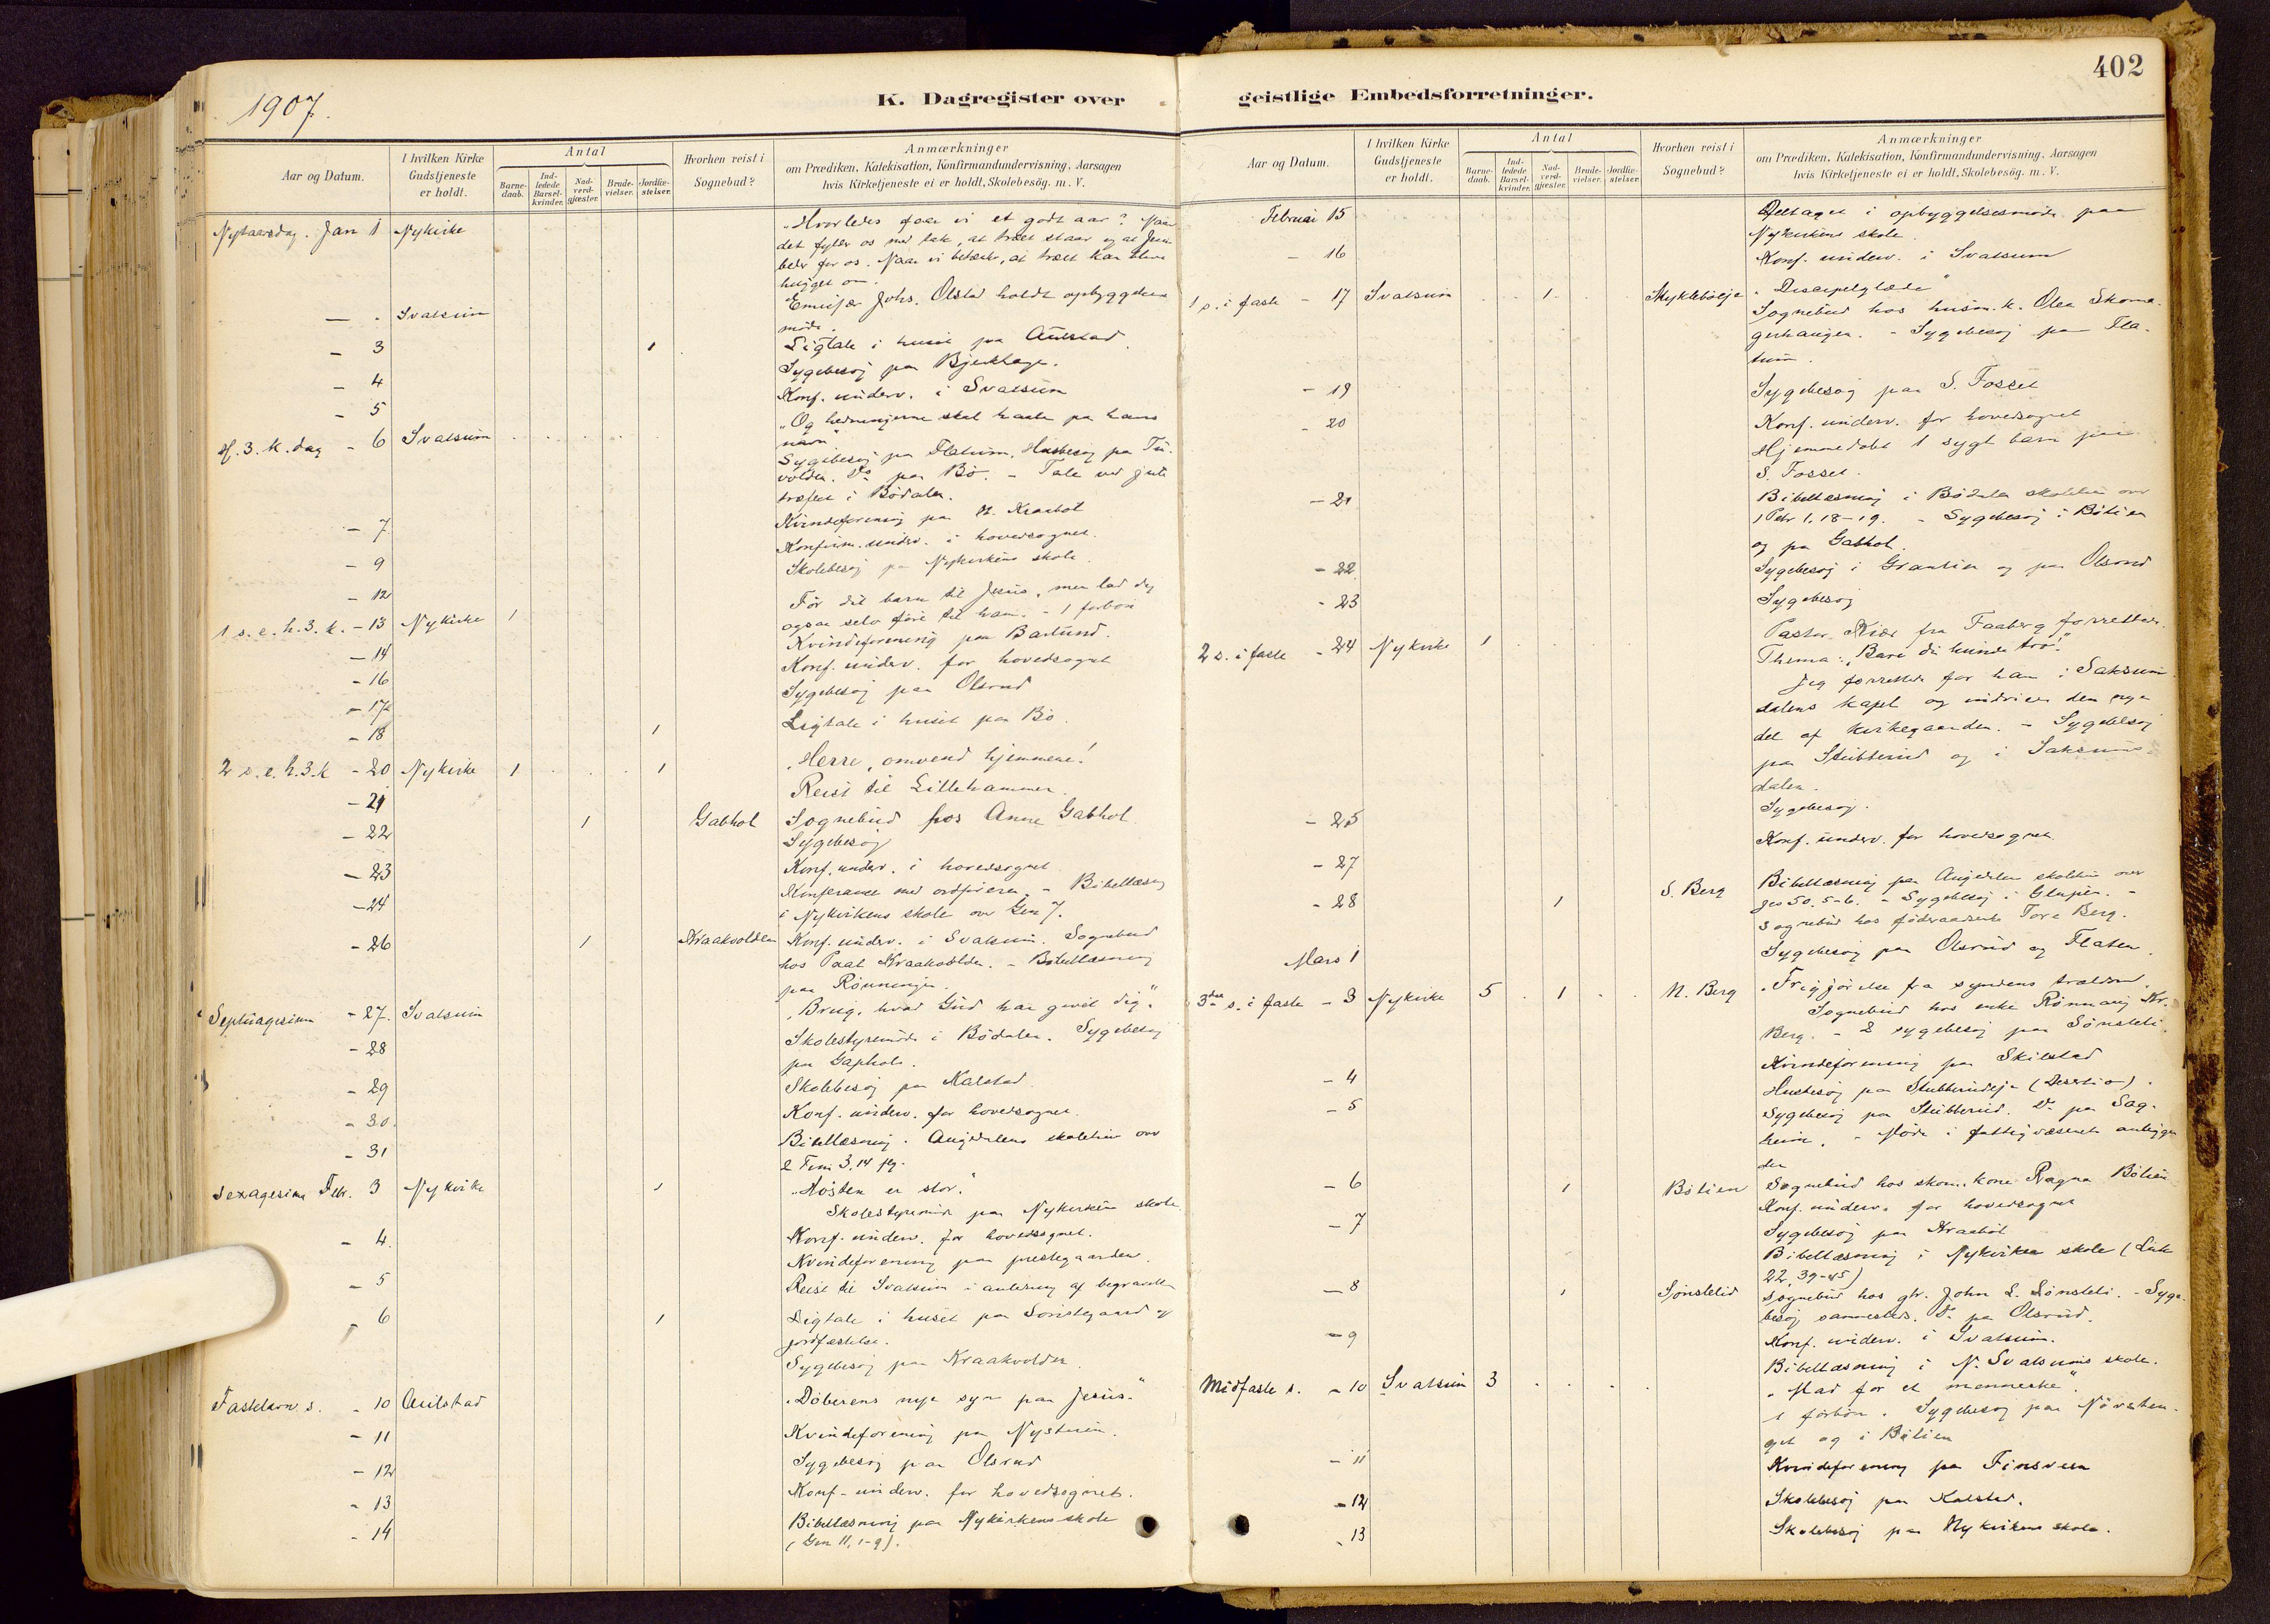 SAH, Vestre Gausdal prestekontor, Ministerialbok nr. 1, 1887-1914, s. 402